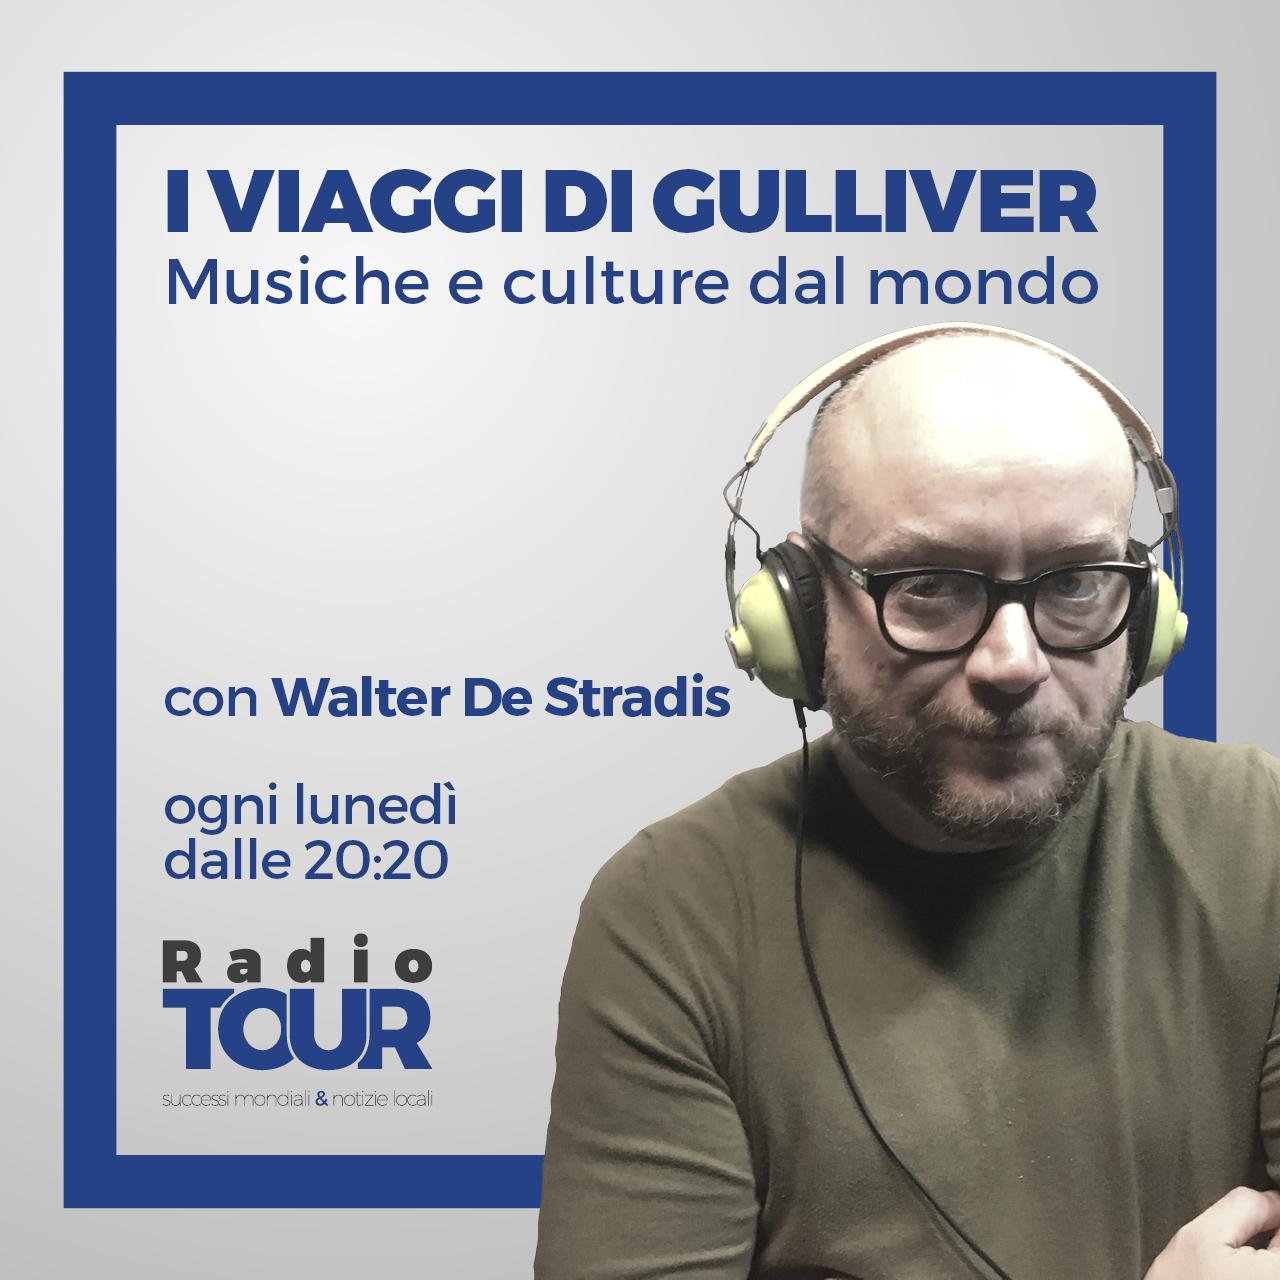 Walter DE STRADIS